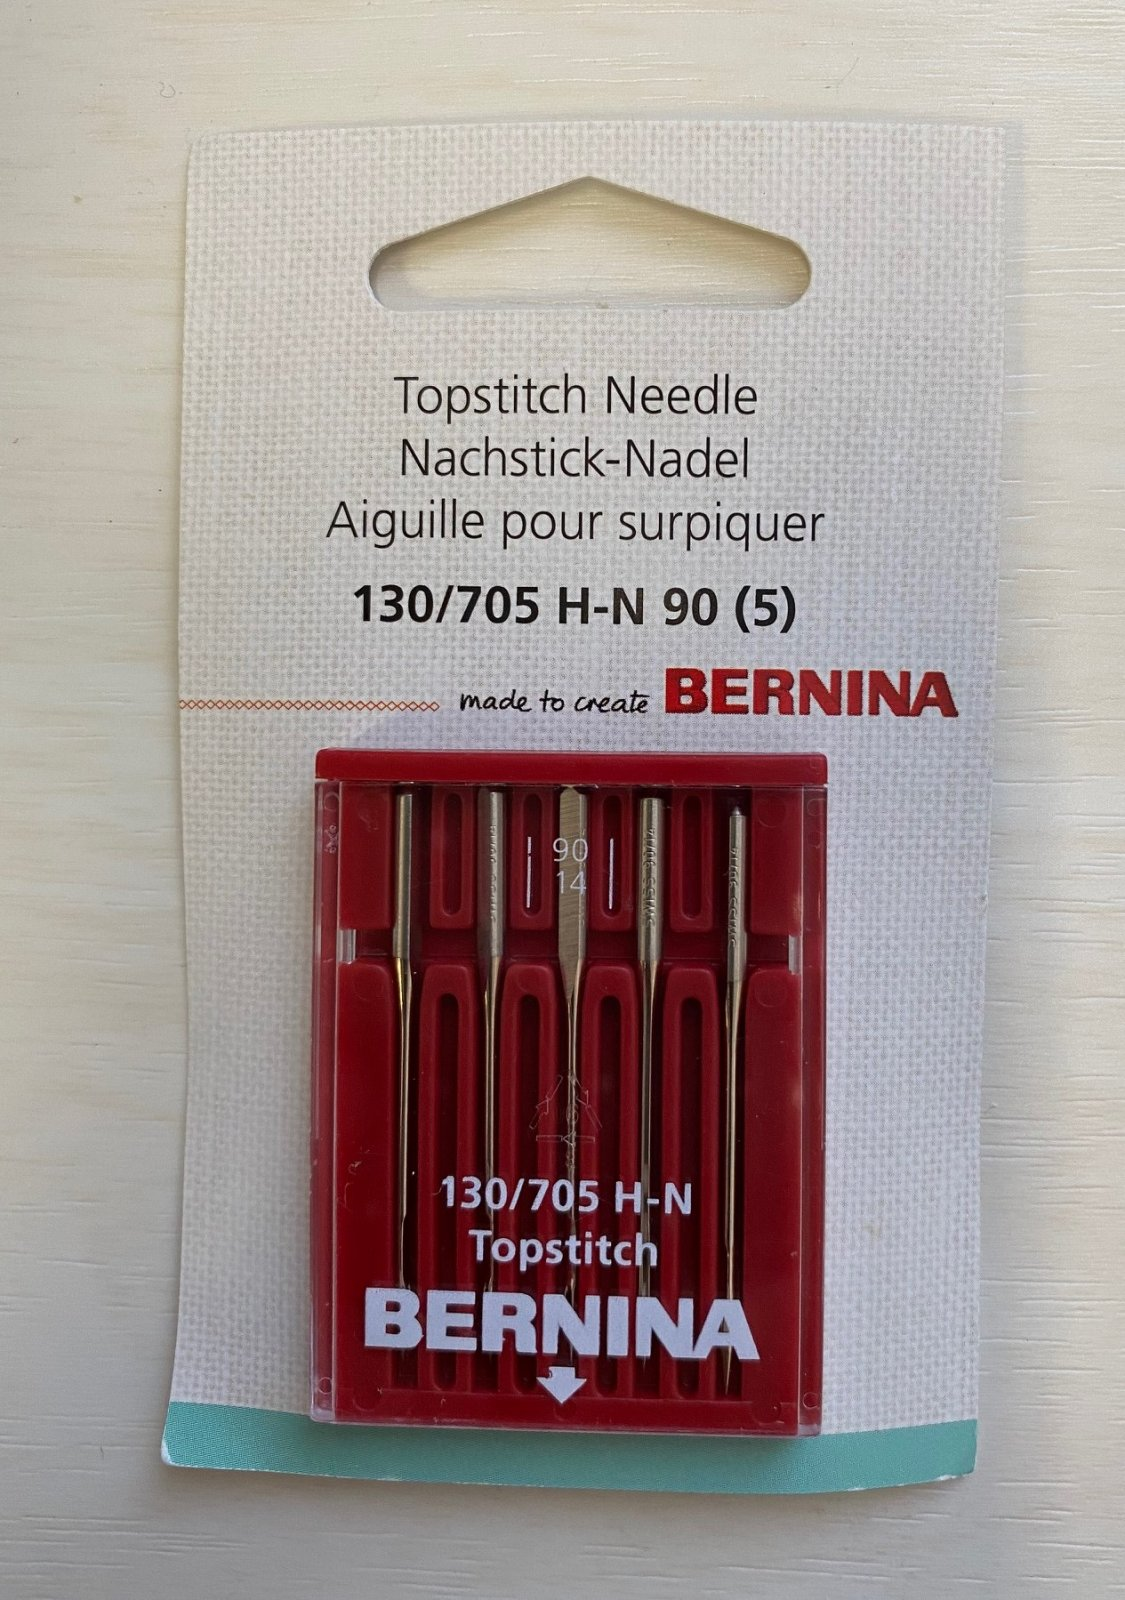 Bernina Top stitch Needle 130/705 H-N 90 (5 pack)